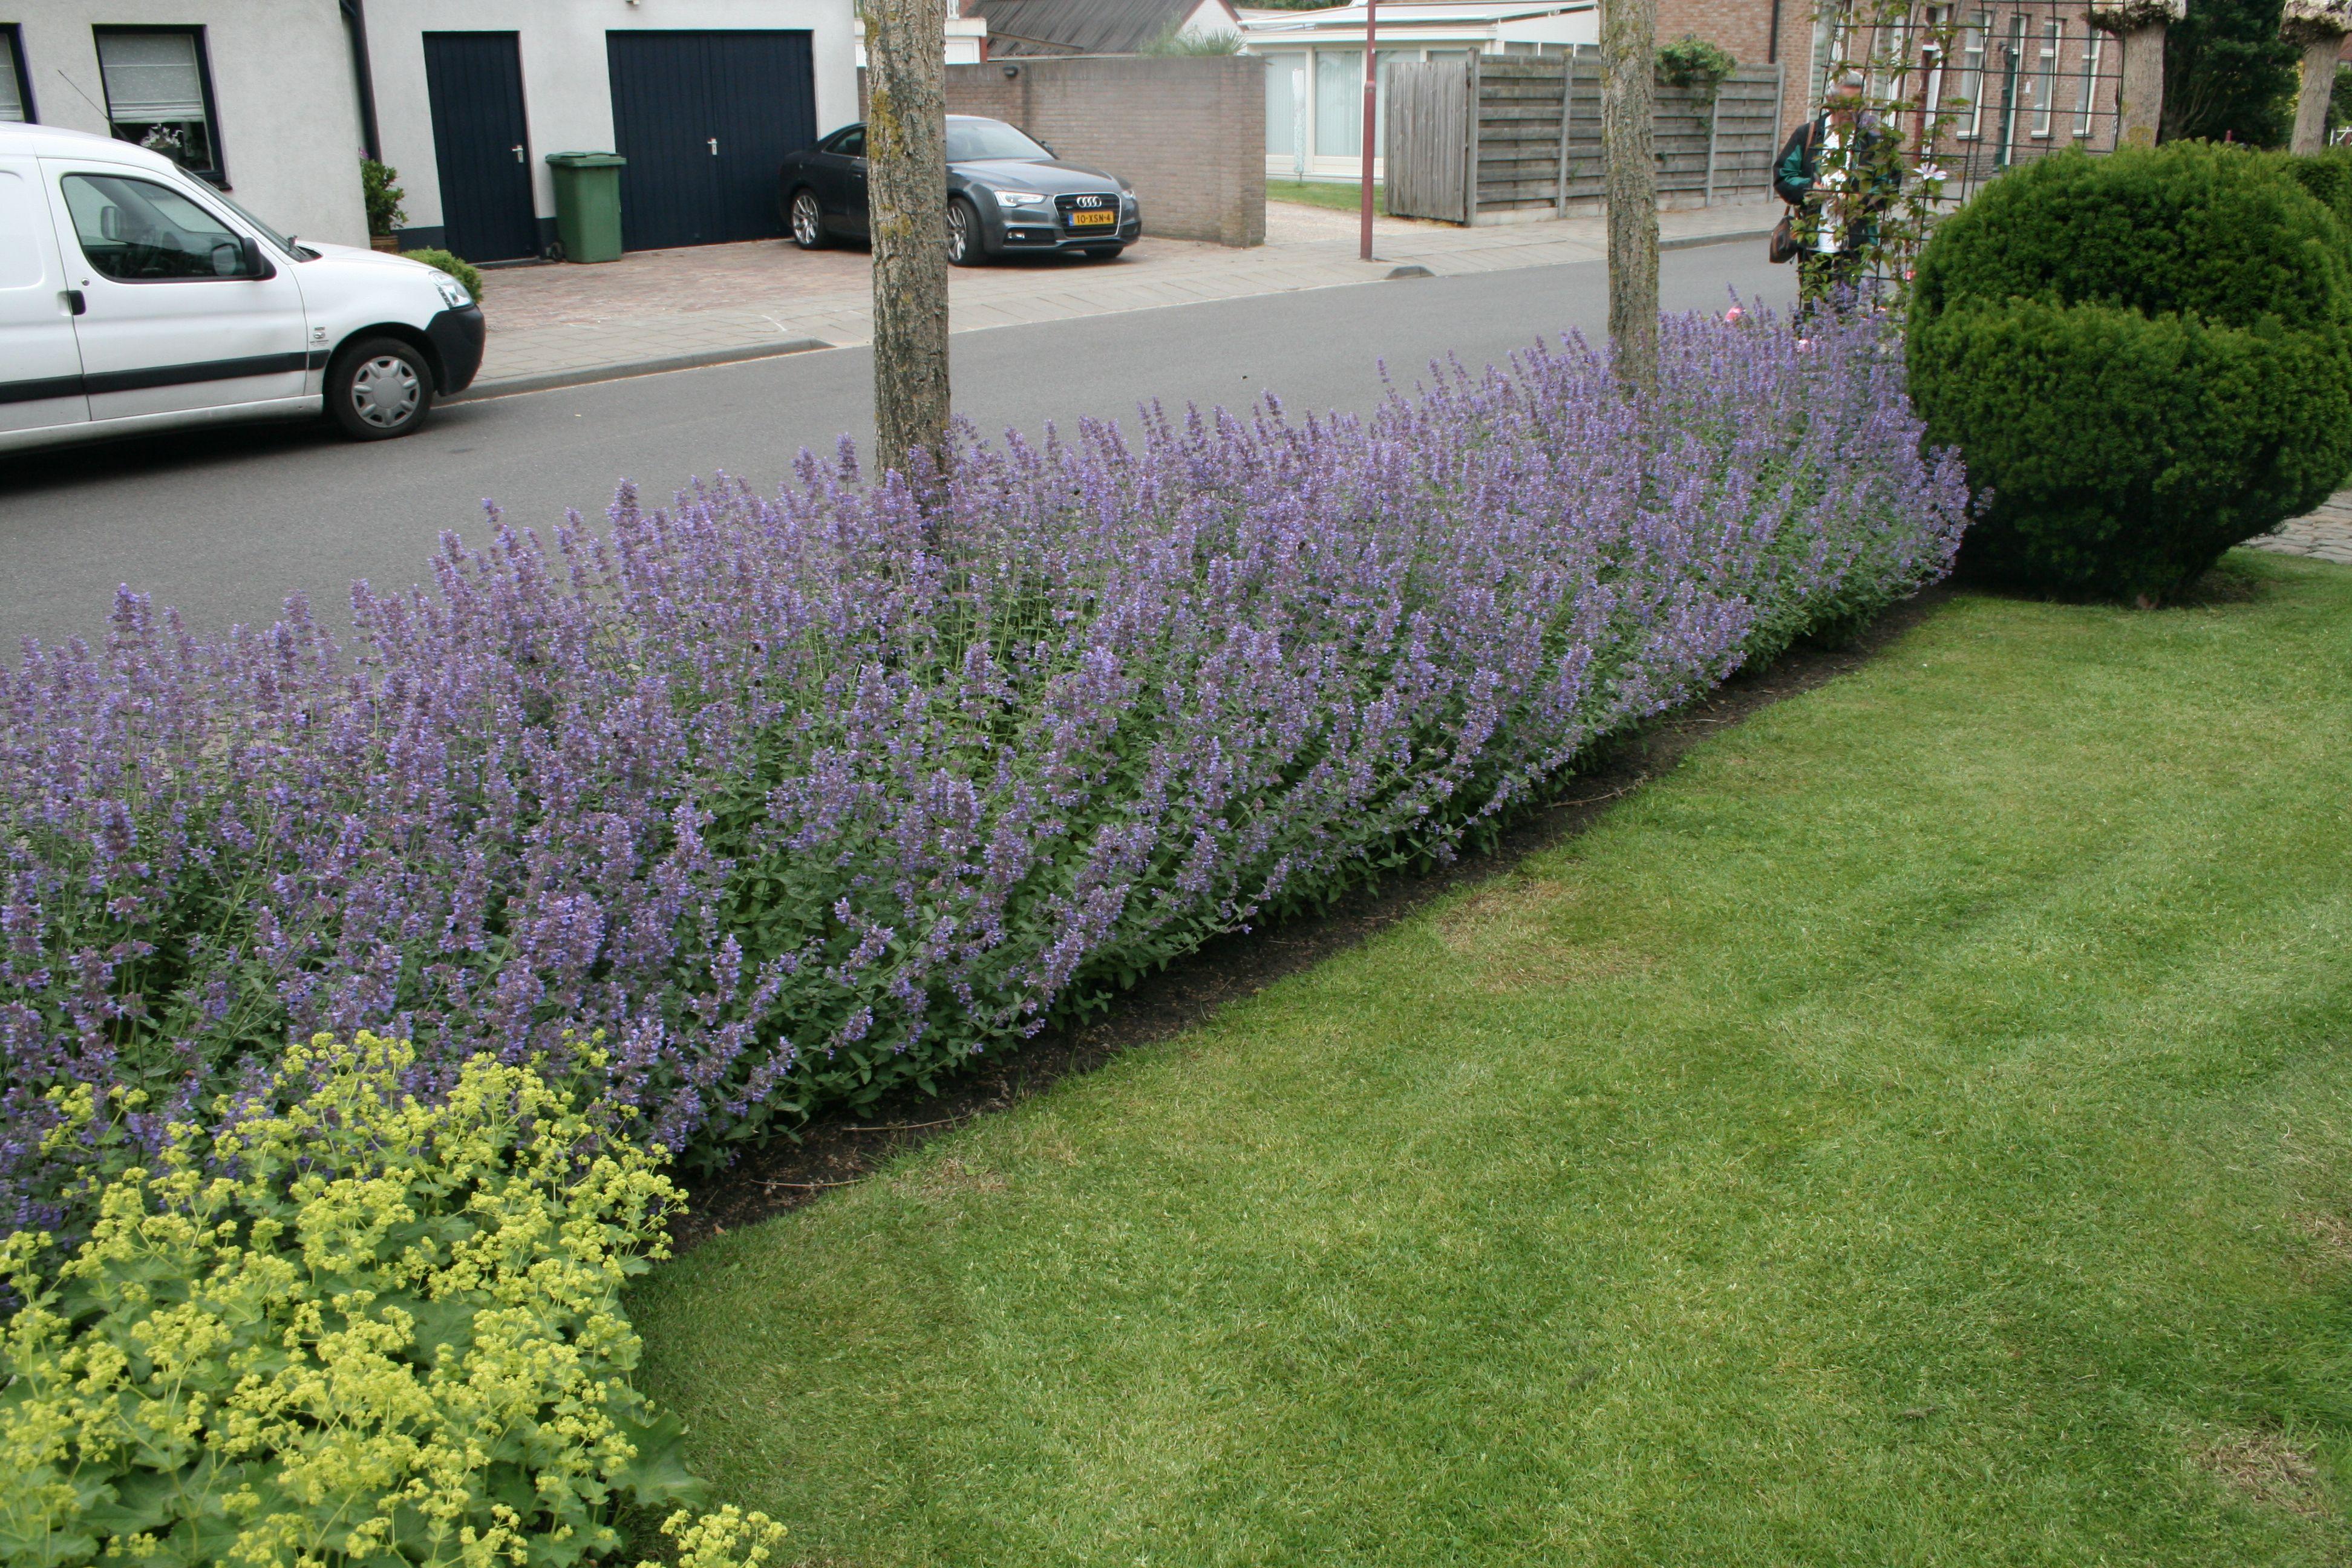 Katzenminze Vorgarten Laura Dingemans Holland Bepflanzung Vorgarten Garten Ideen